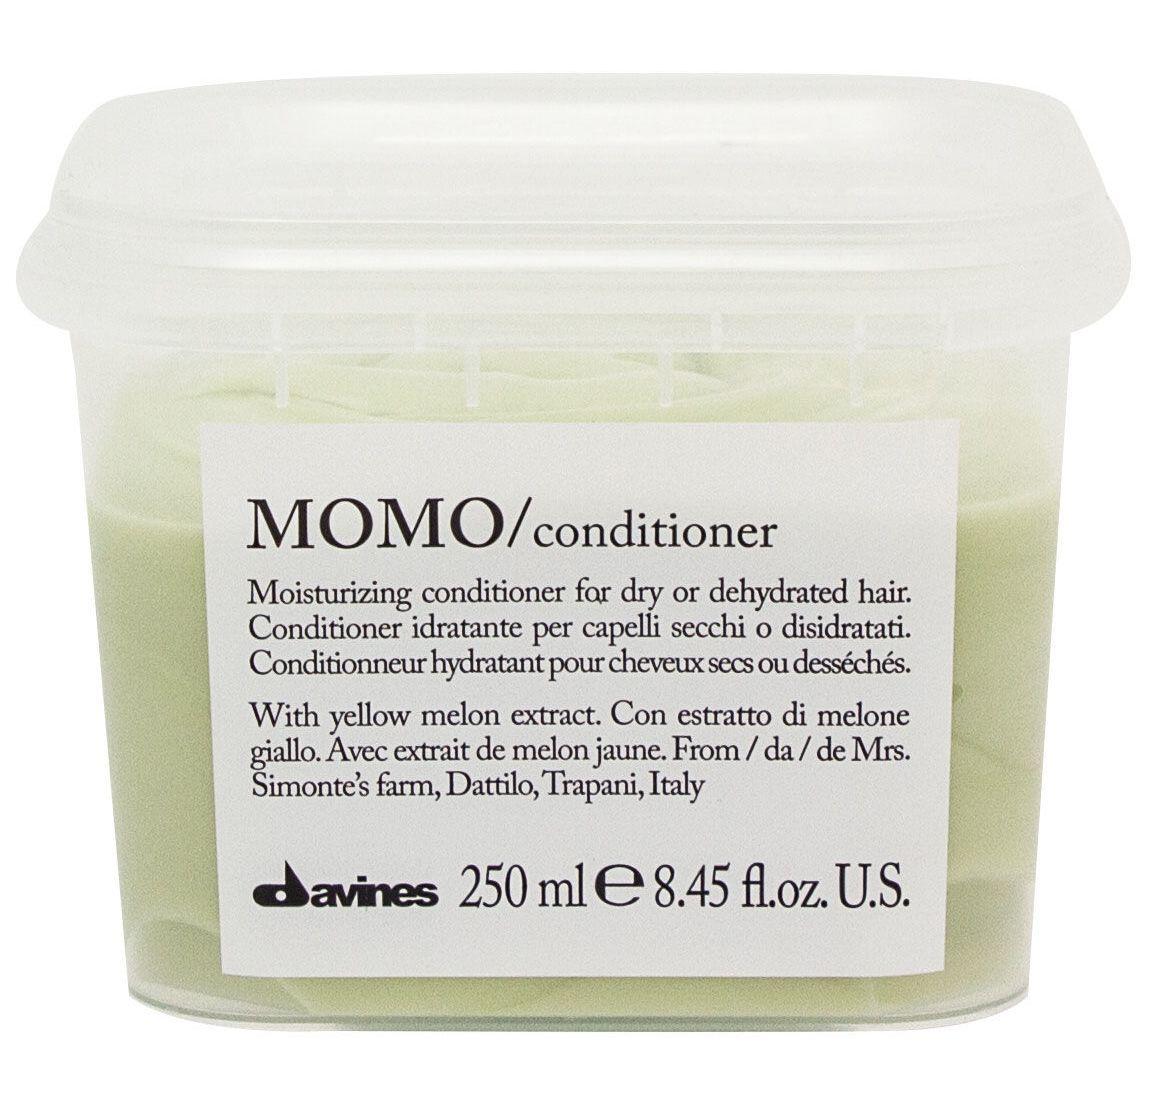 Davines Увлажняющий кондиционер, облегчающий расчесывание волос Essential Haircare New Momo Conditioner, 250 мл недорого